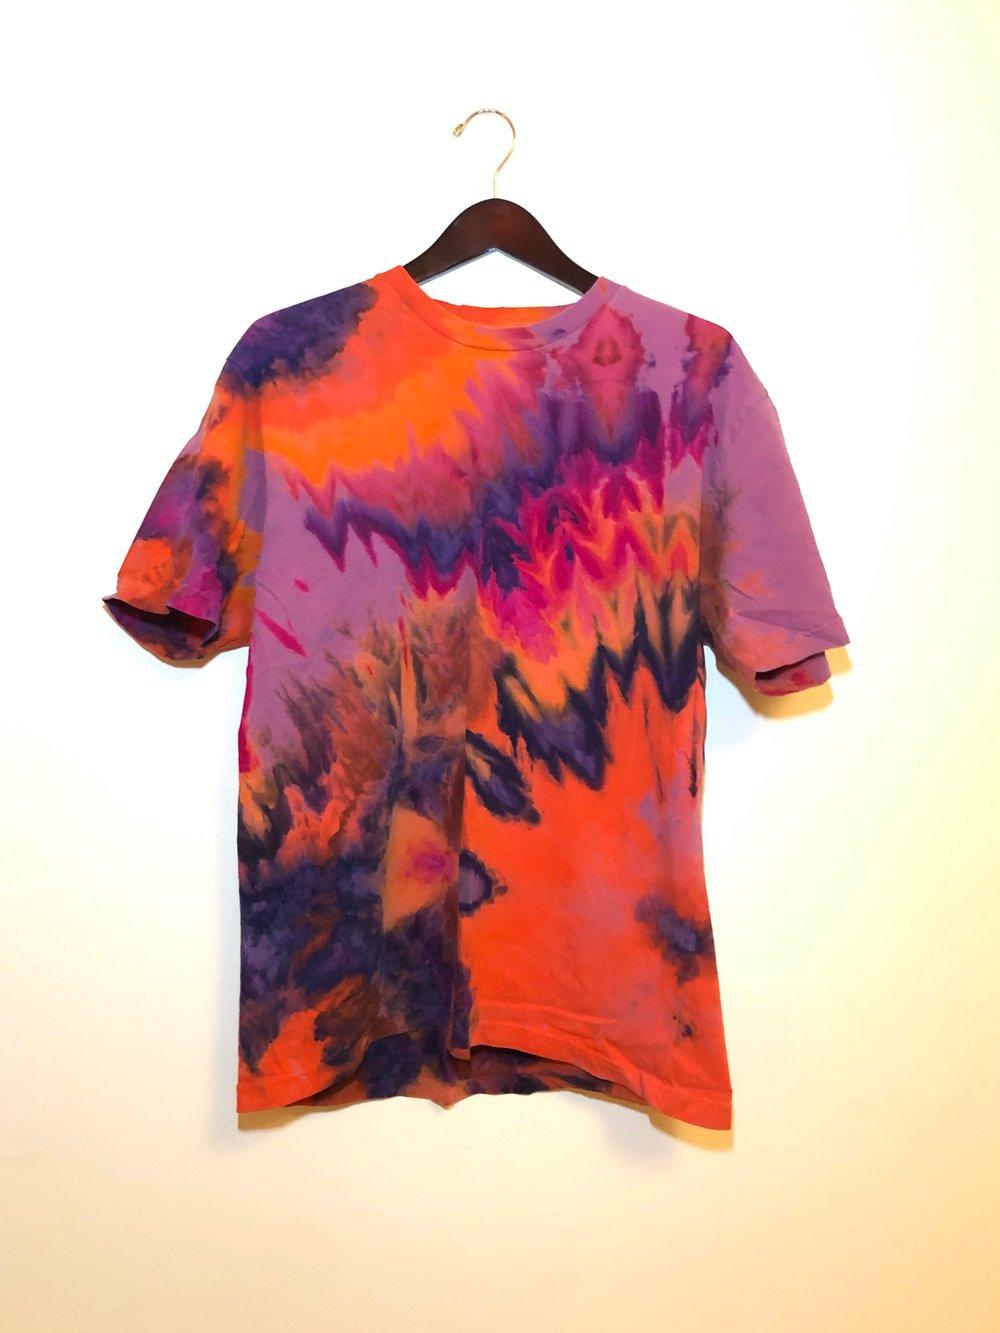 Shirt #35 - Medium